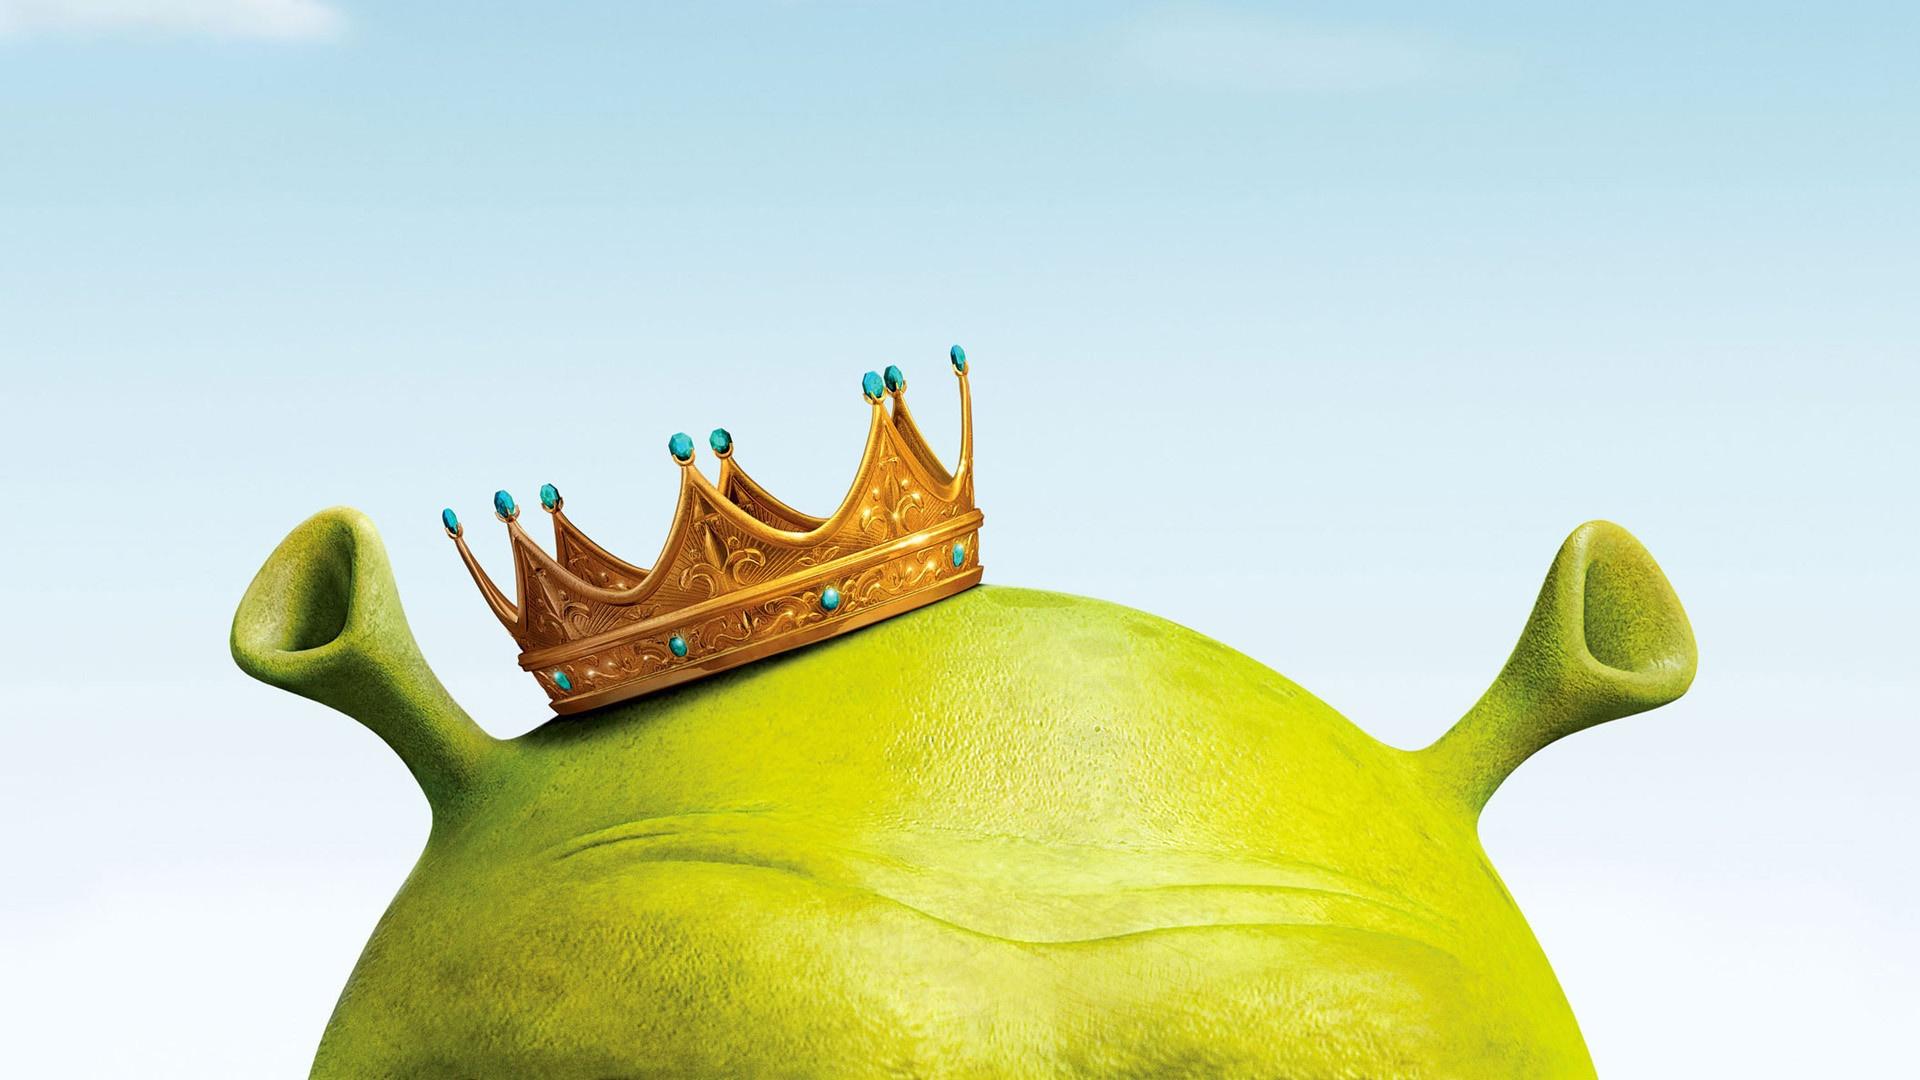 Shrek Tercero - 1920x1080